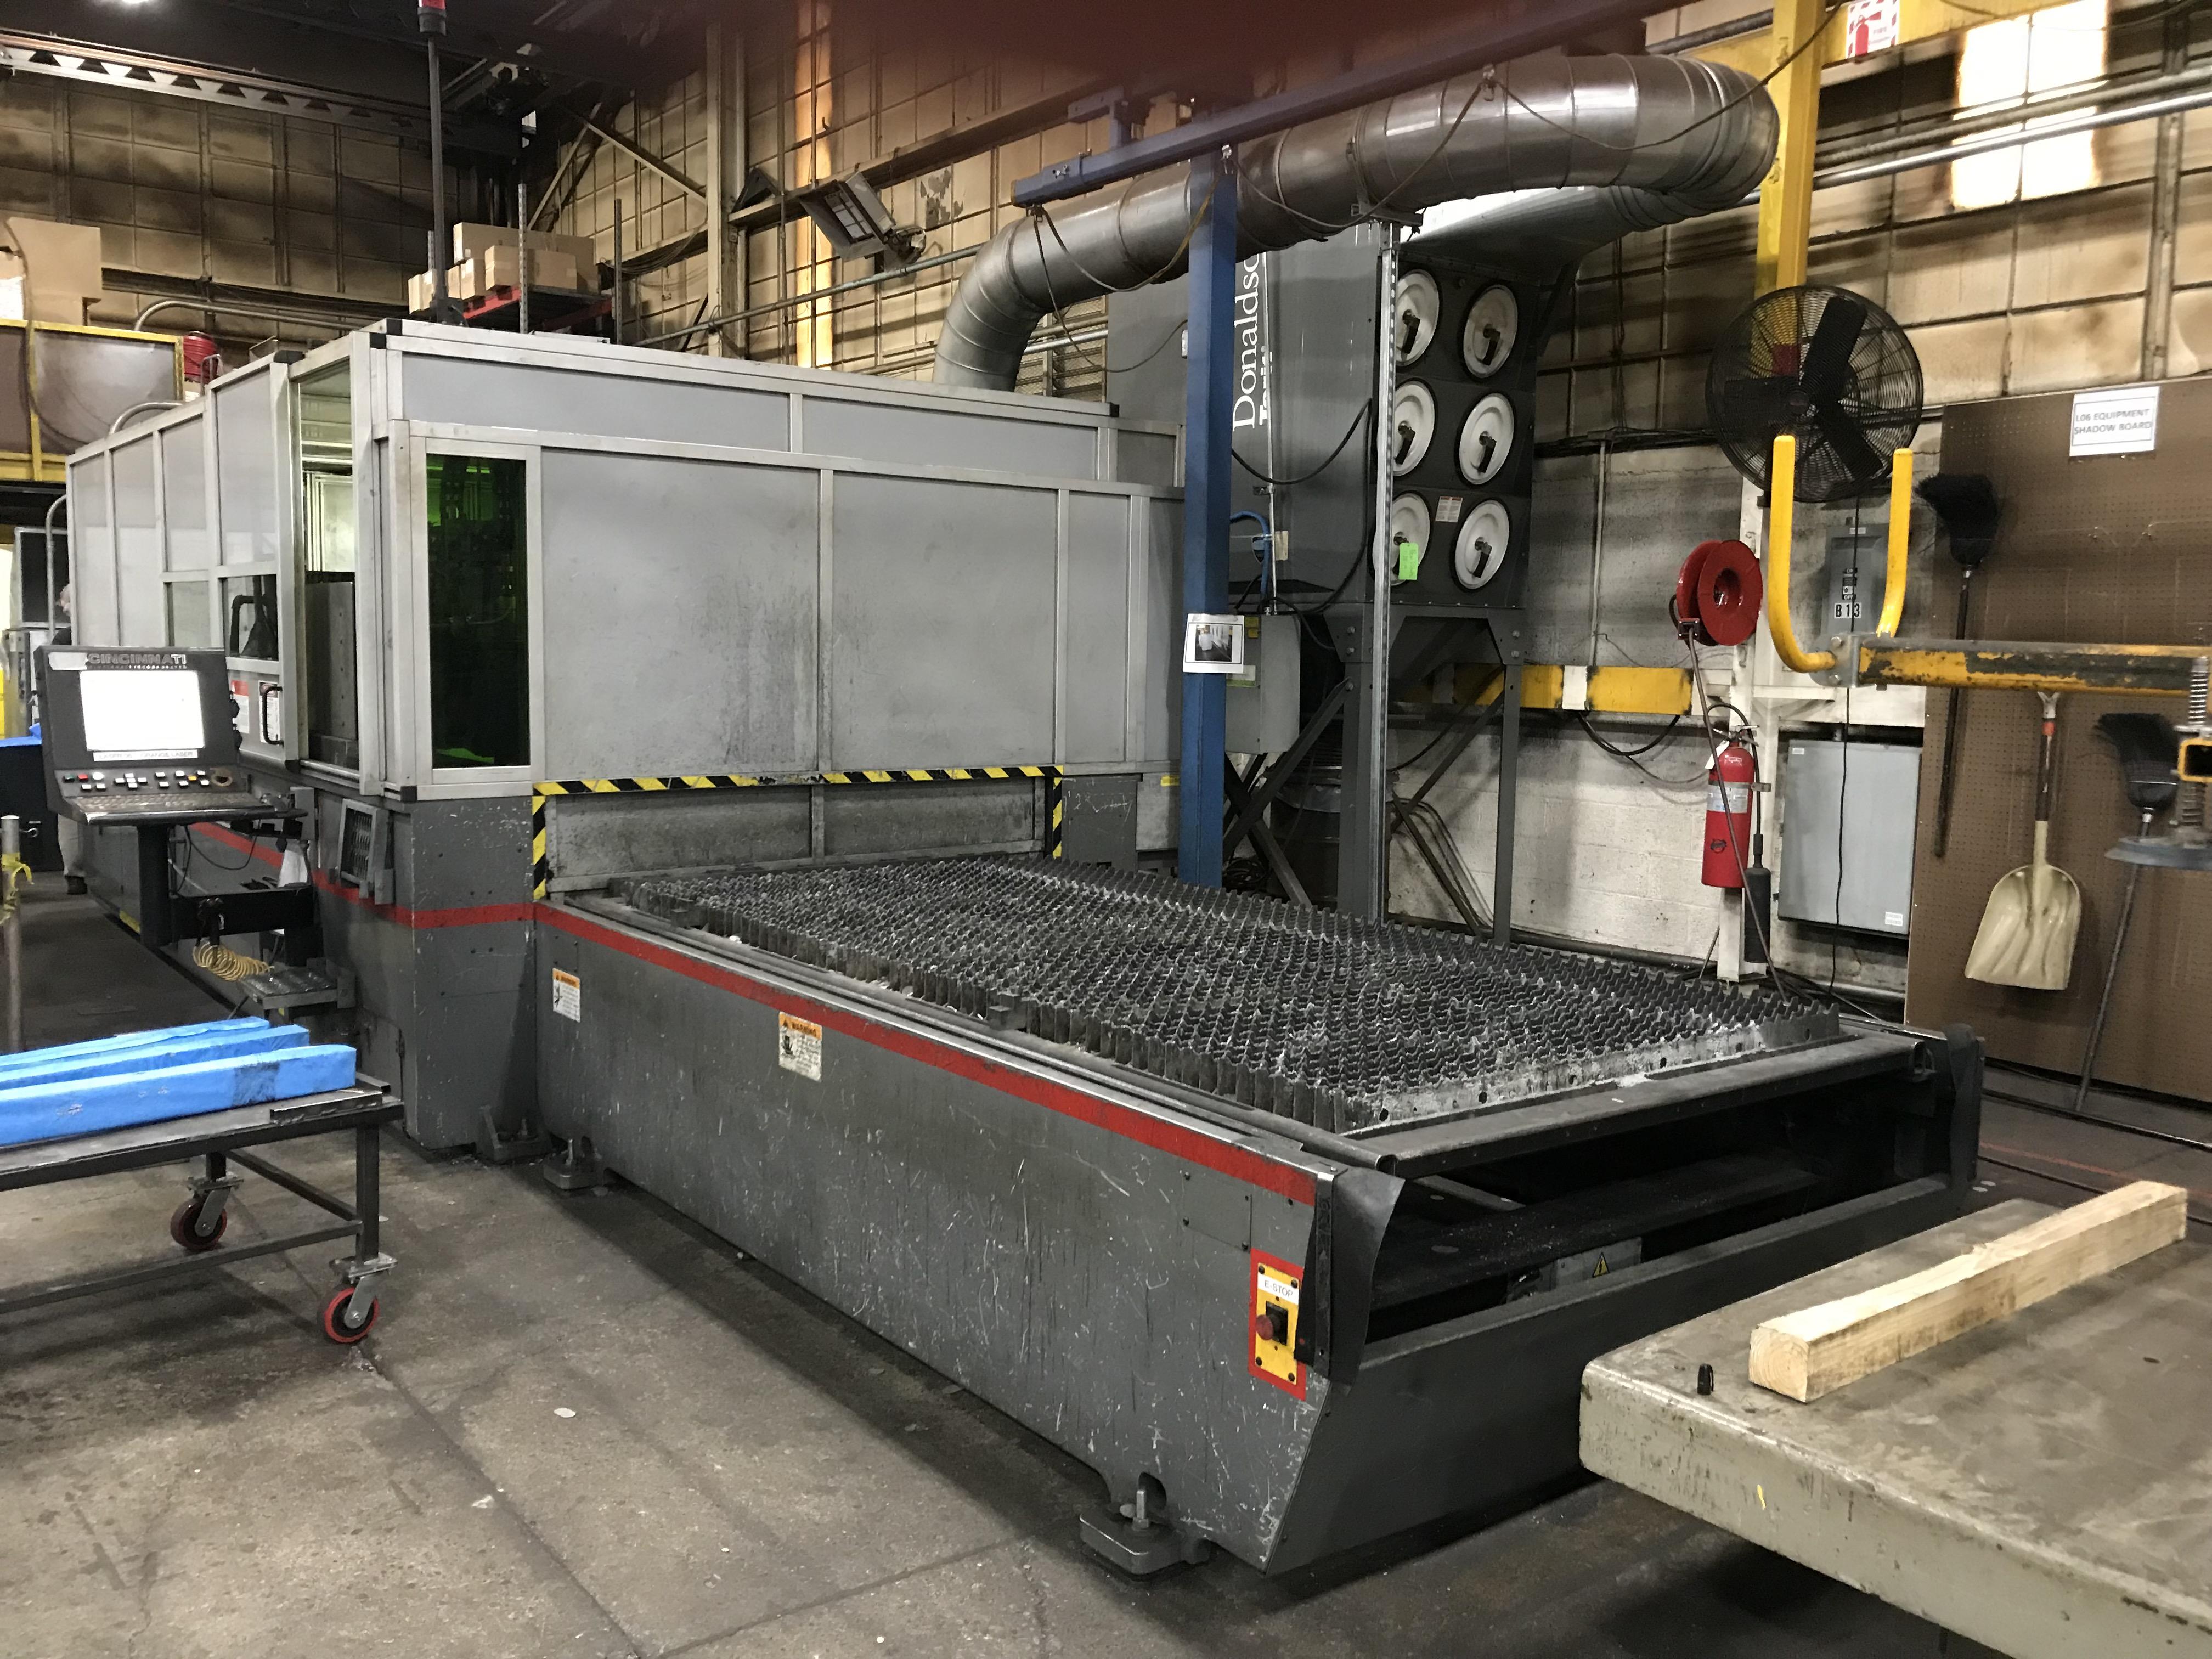 Cincinnati CL940 Fiber Laser, 4,000 Watt, 5' x 10' Dual Pallets, Chiller, Dust Collector, Low Hours